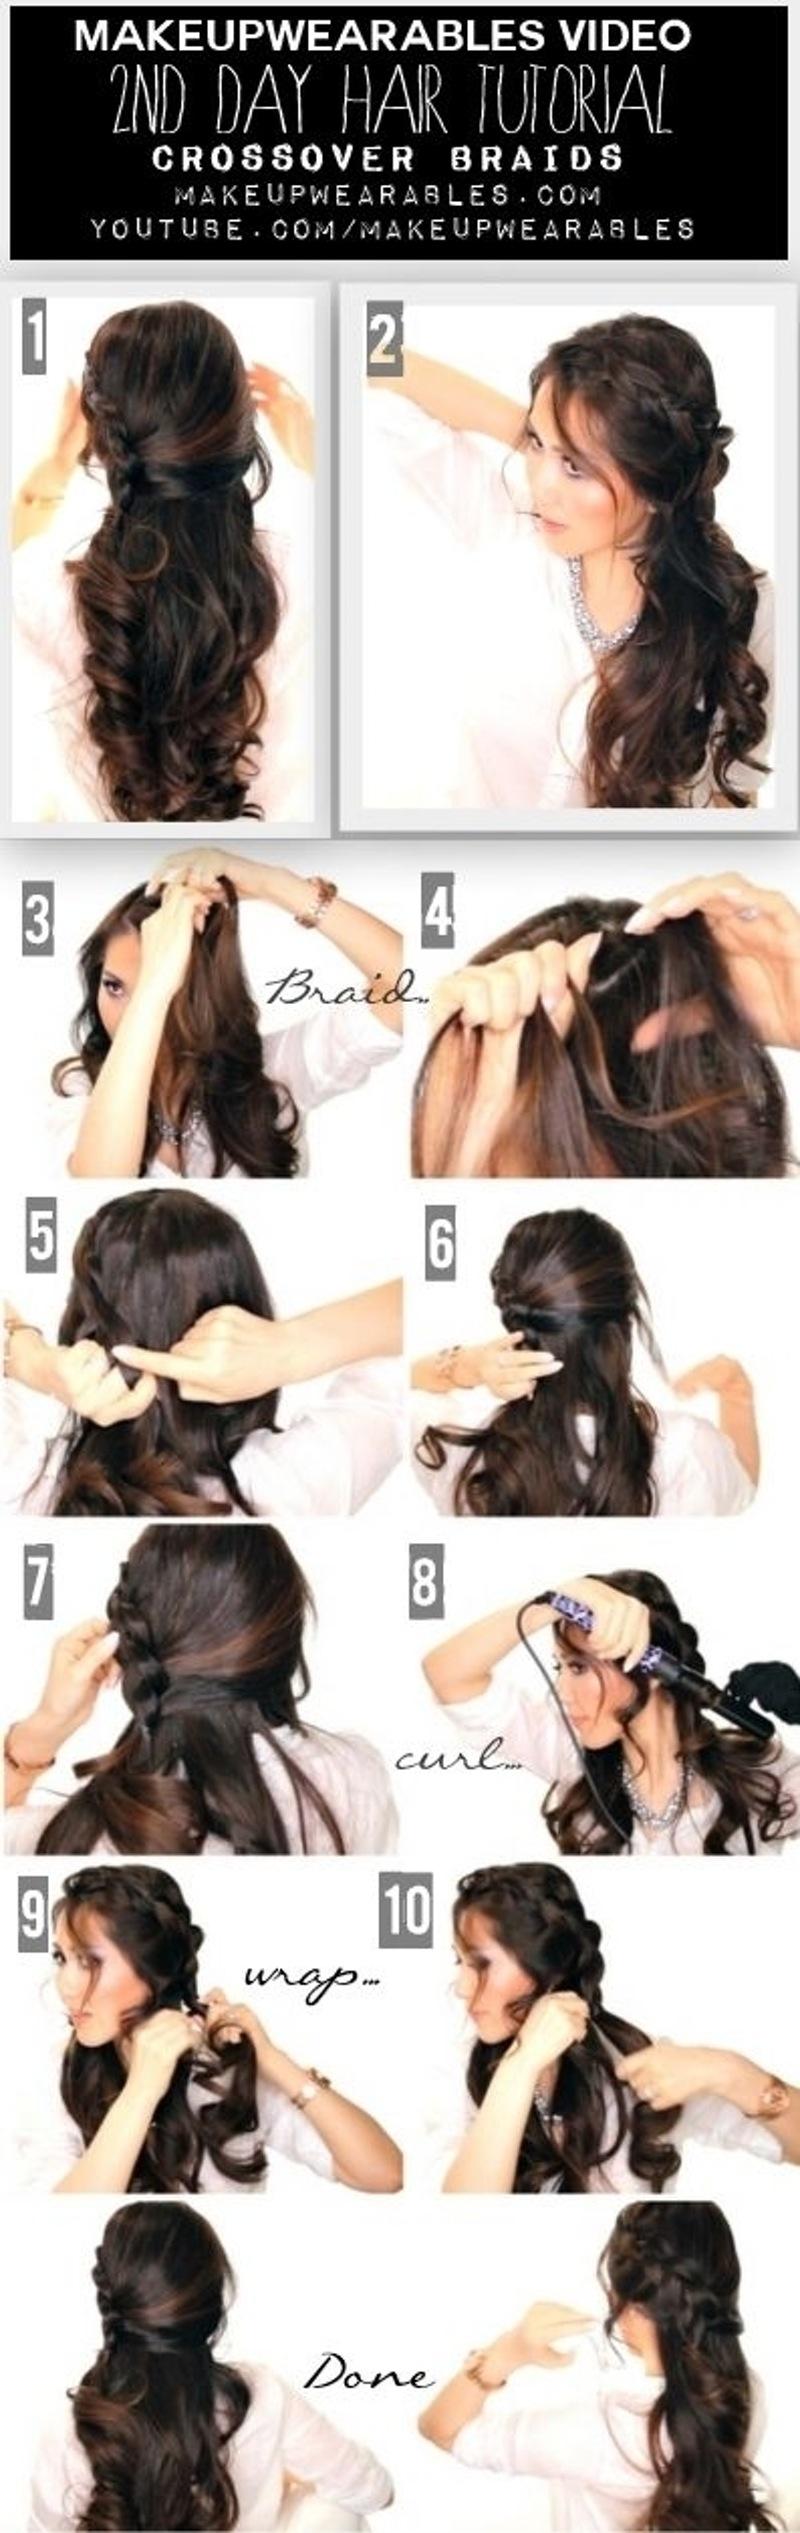 6. #Crossover Braid Tutorial #Video - 30 Sensational #Second Day ...